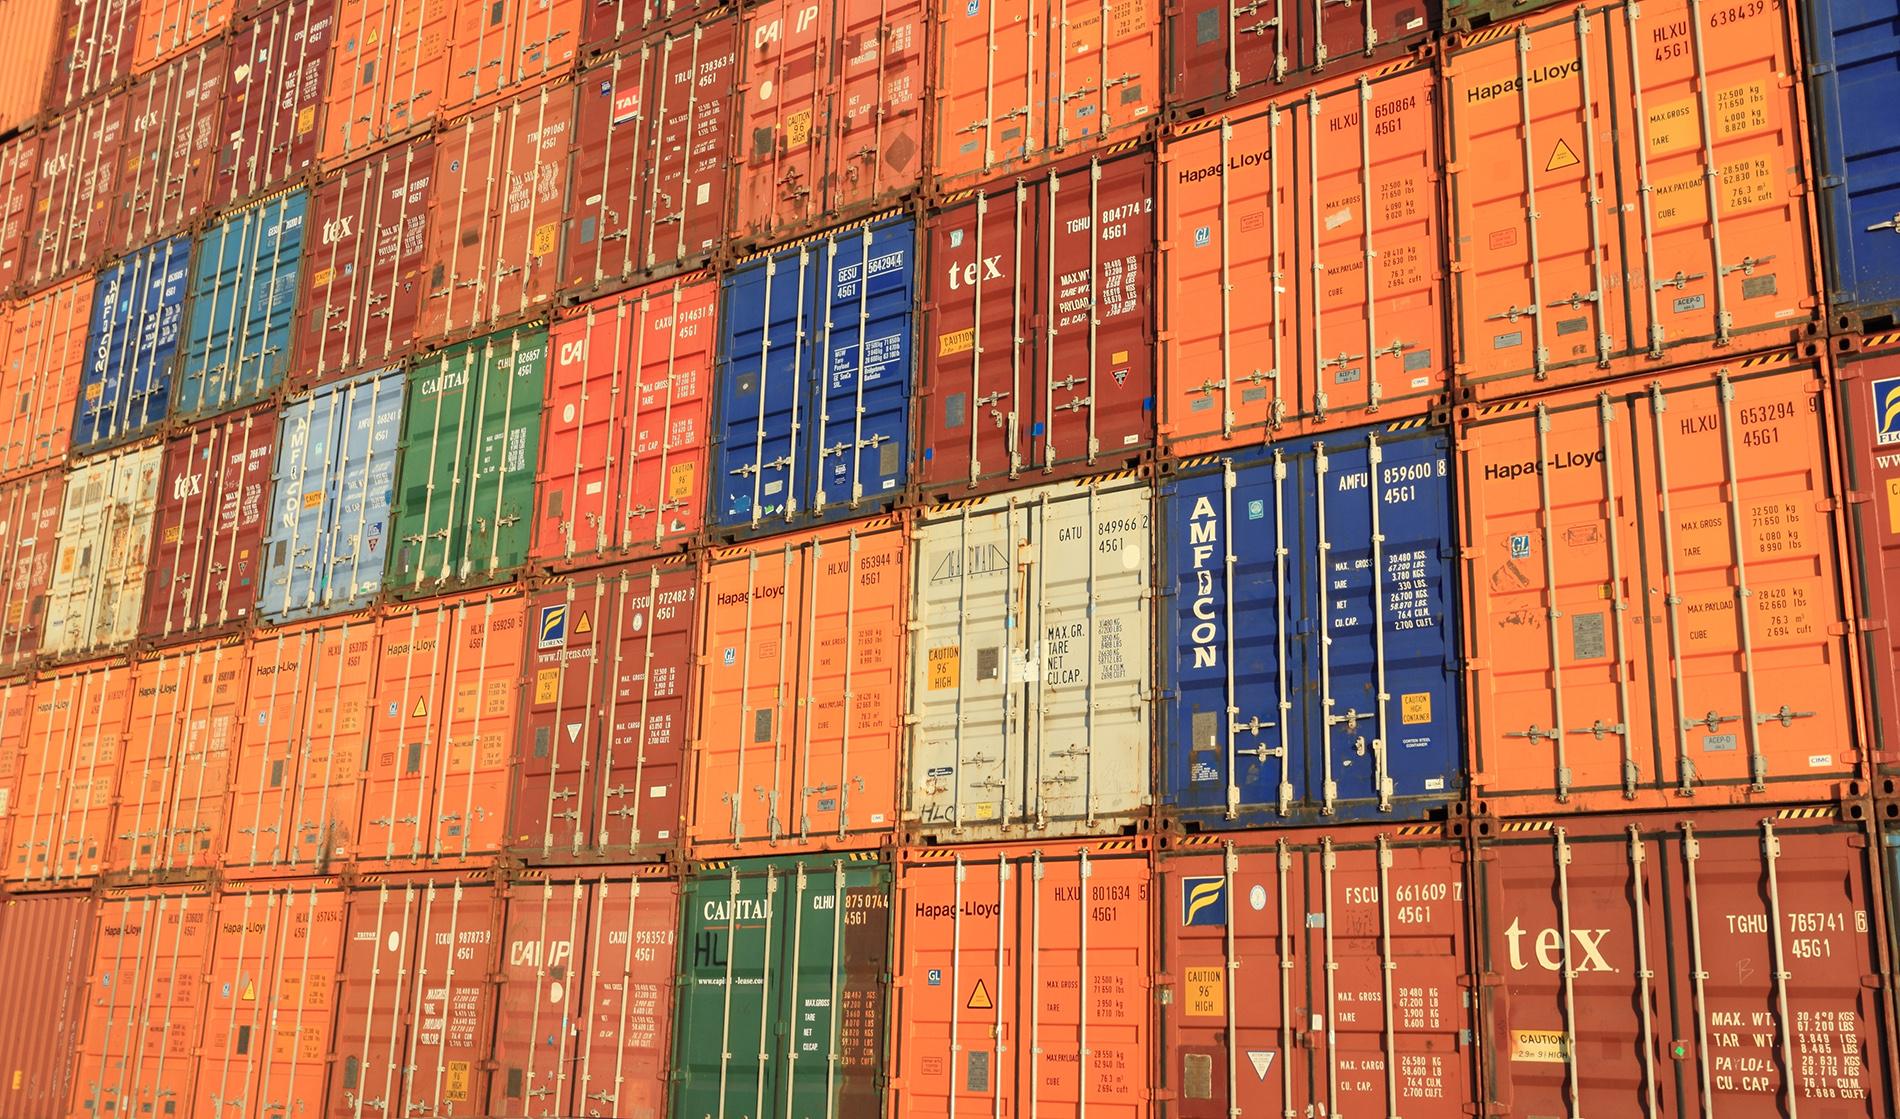 How the cargo ship food look like on trip